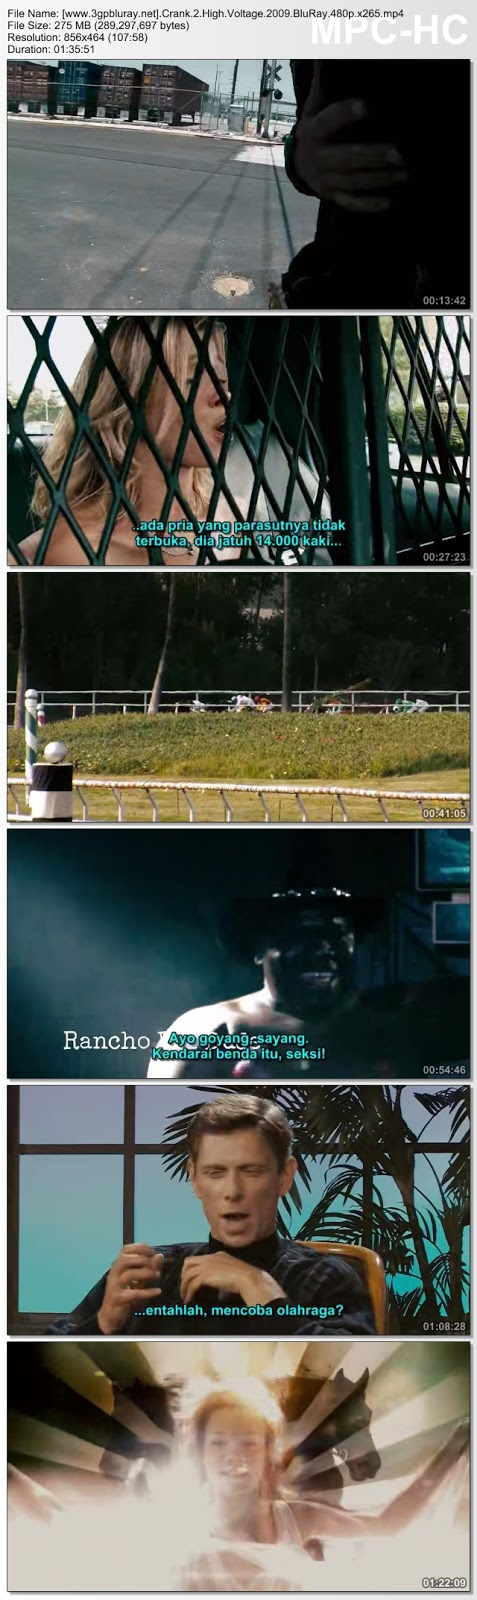 Screenshots Download Crank: High Voltage (2009) BluRay 480p & 3GP Subtitle Indonesia